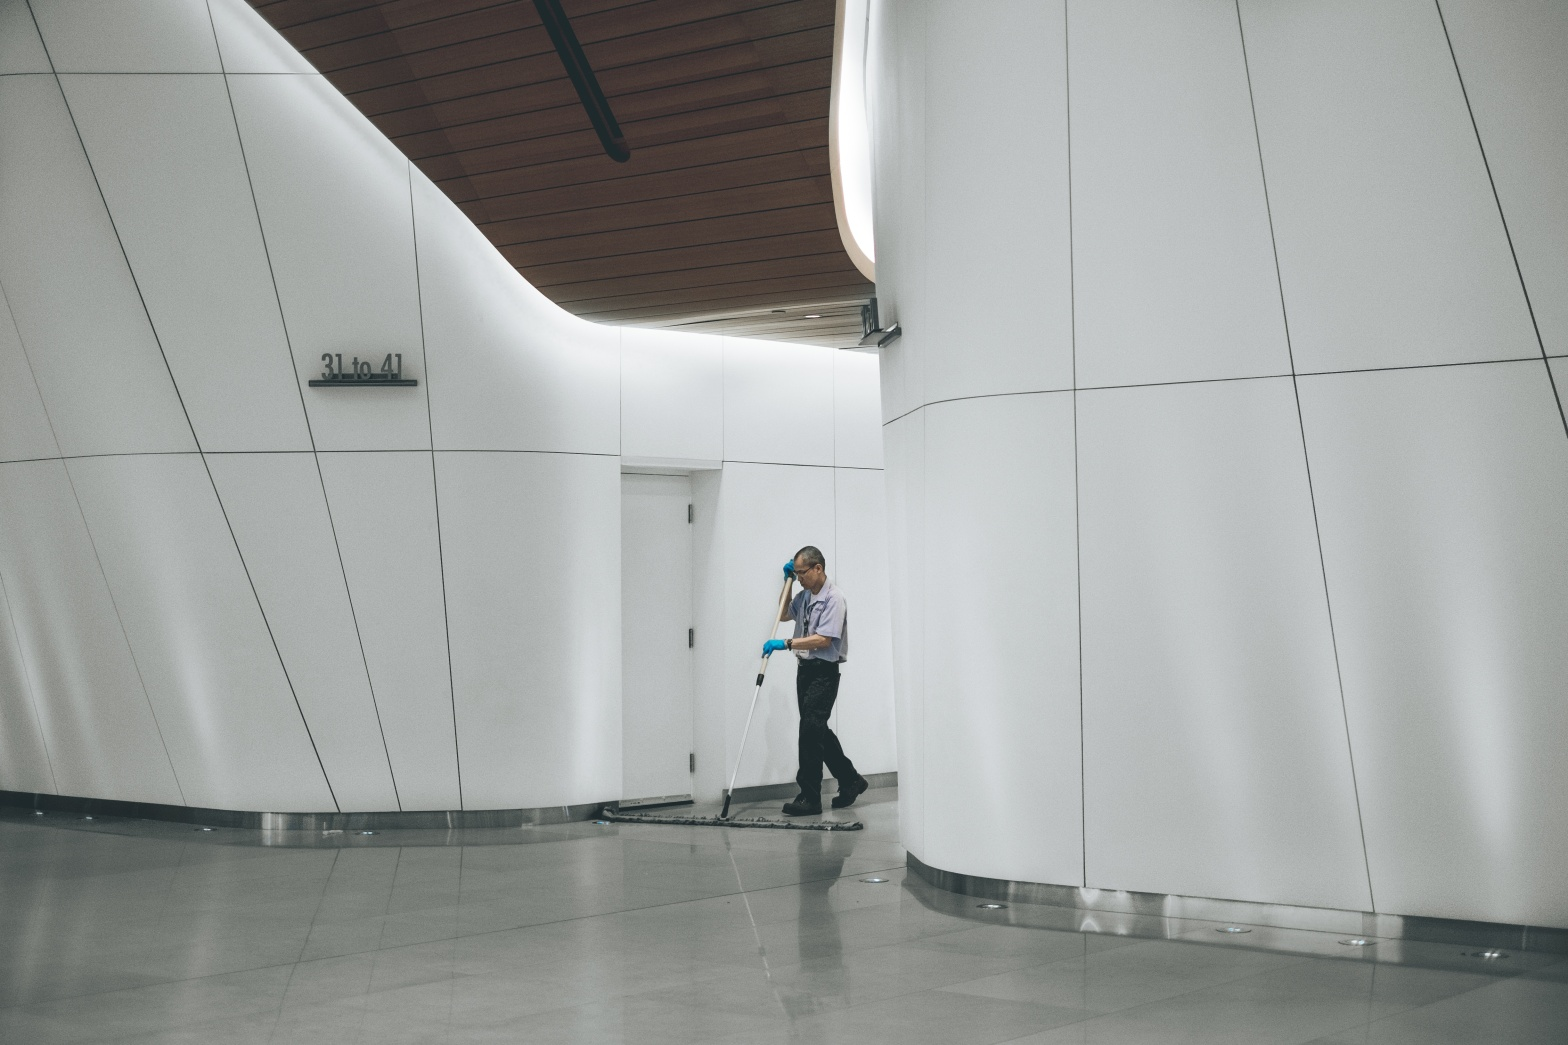 Janitor sweeping floor in modern office building